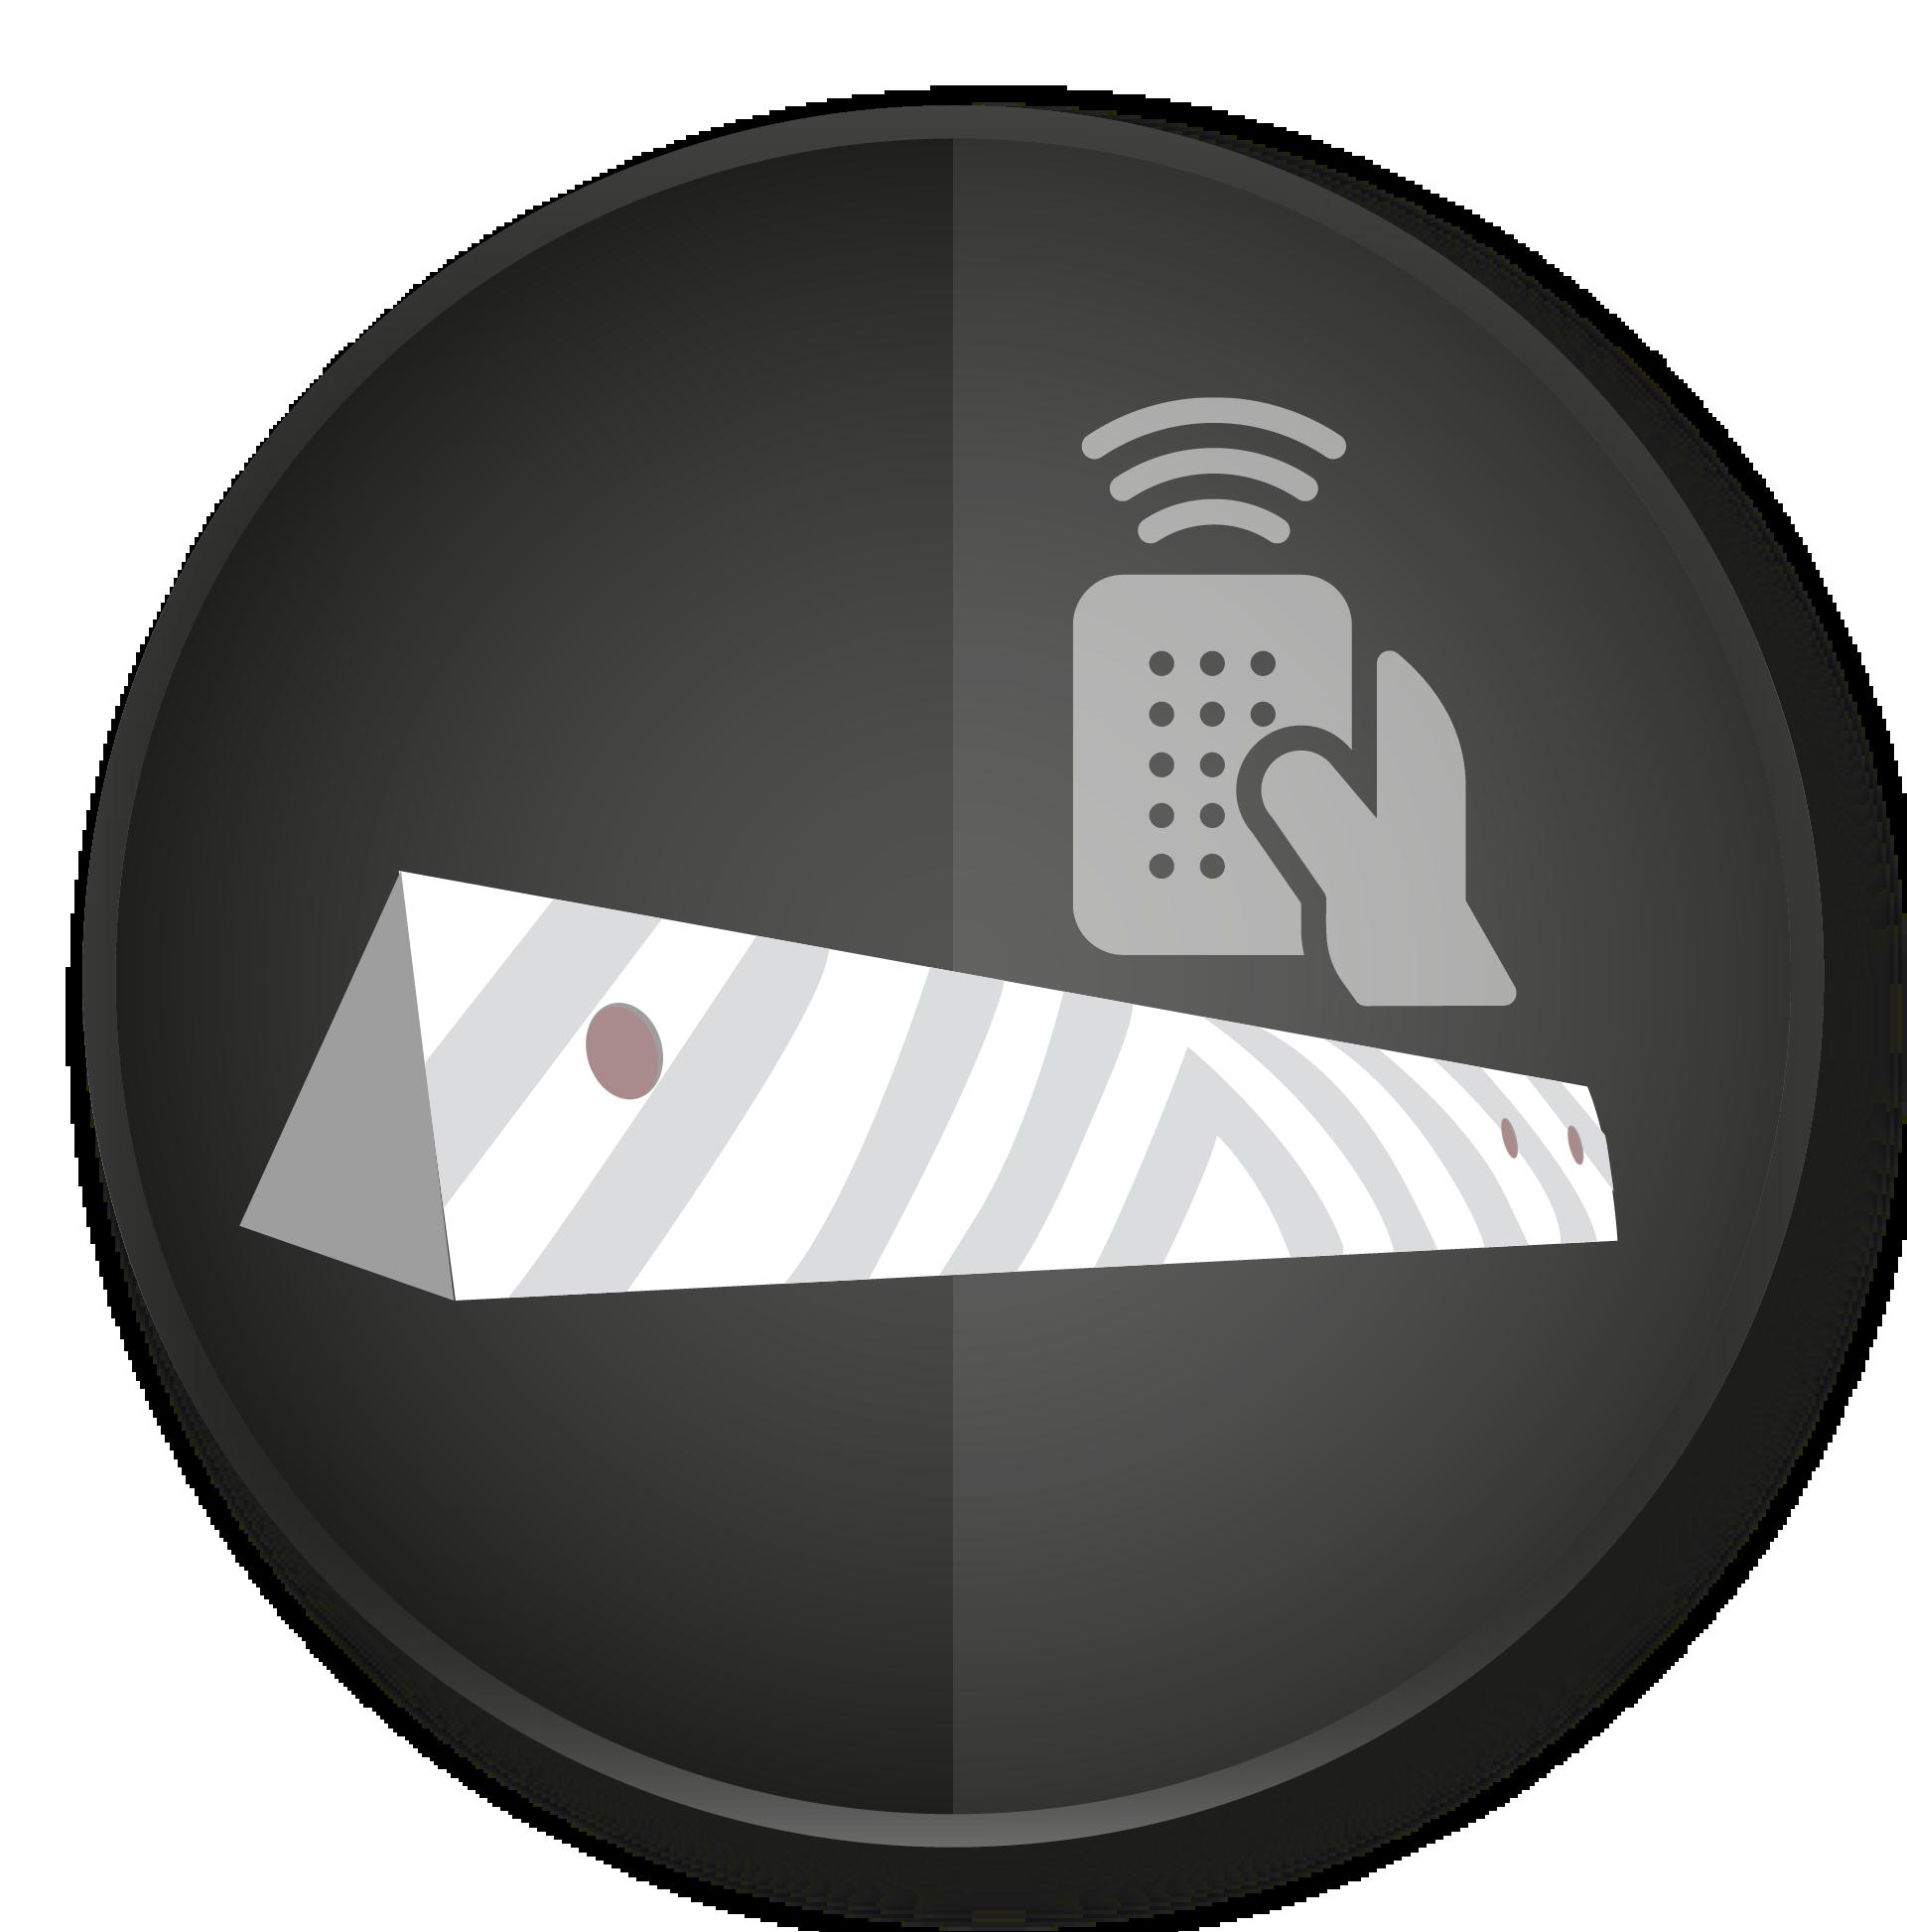 adgangskontroll, veiblokker